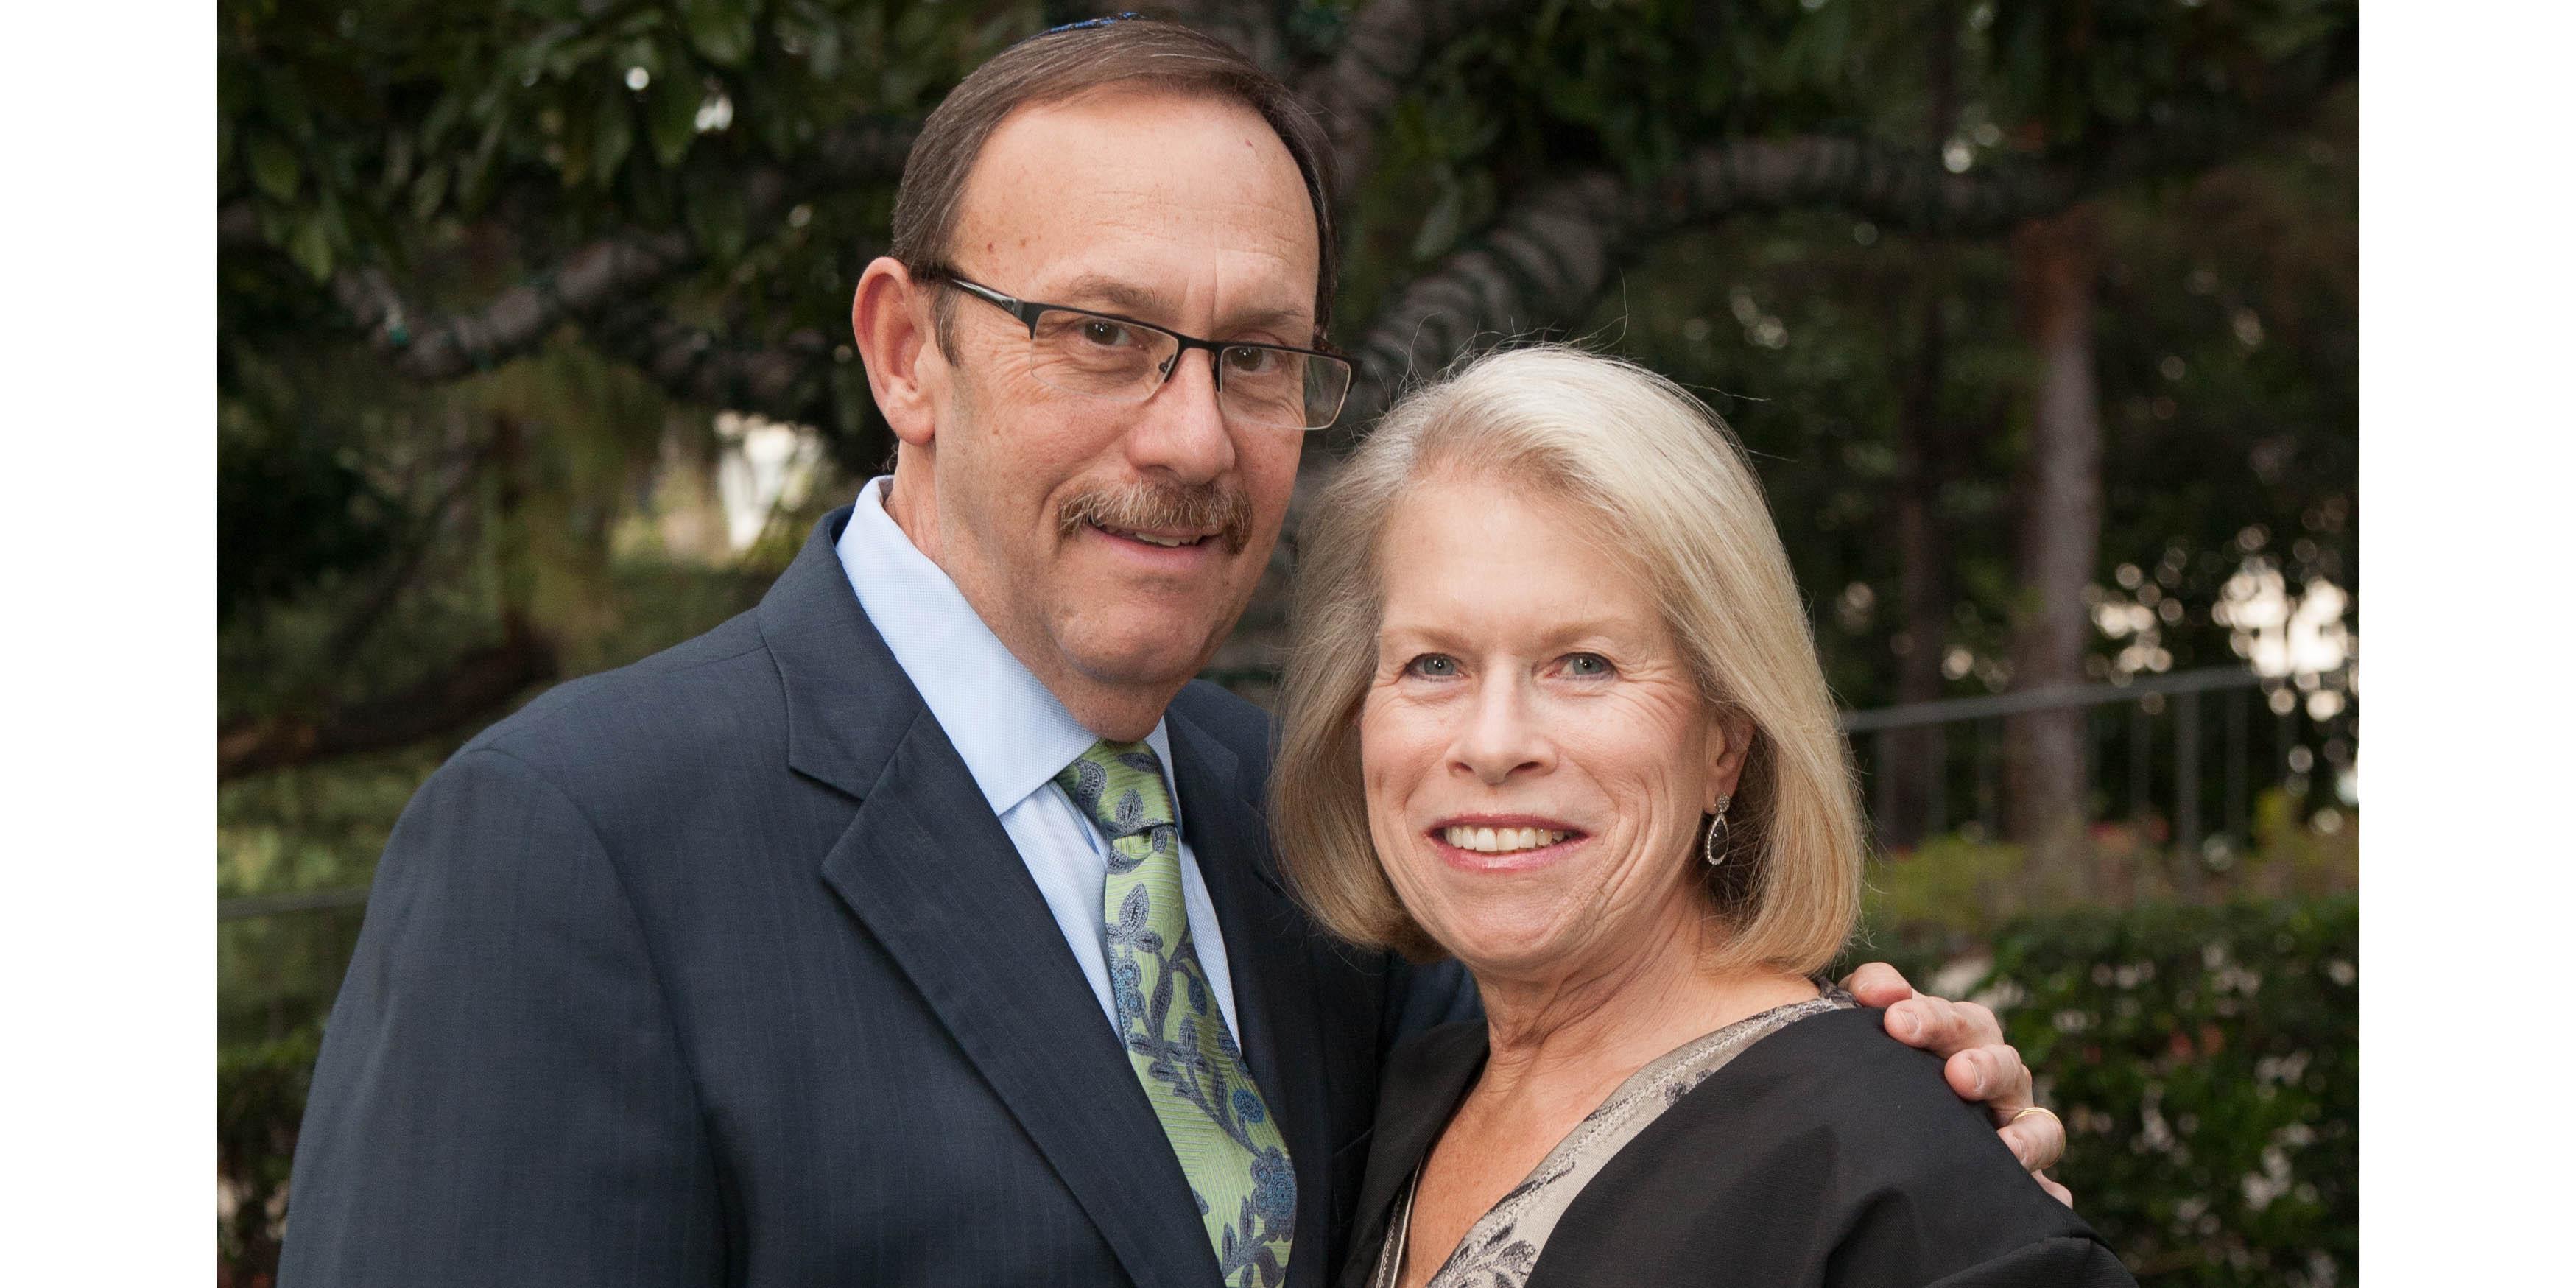 Sheila Baran Spiwak with Alan Spiwak